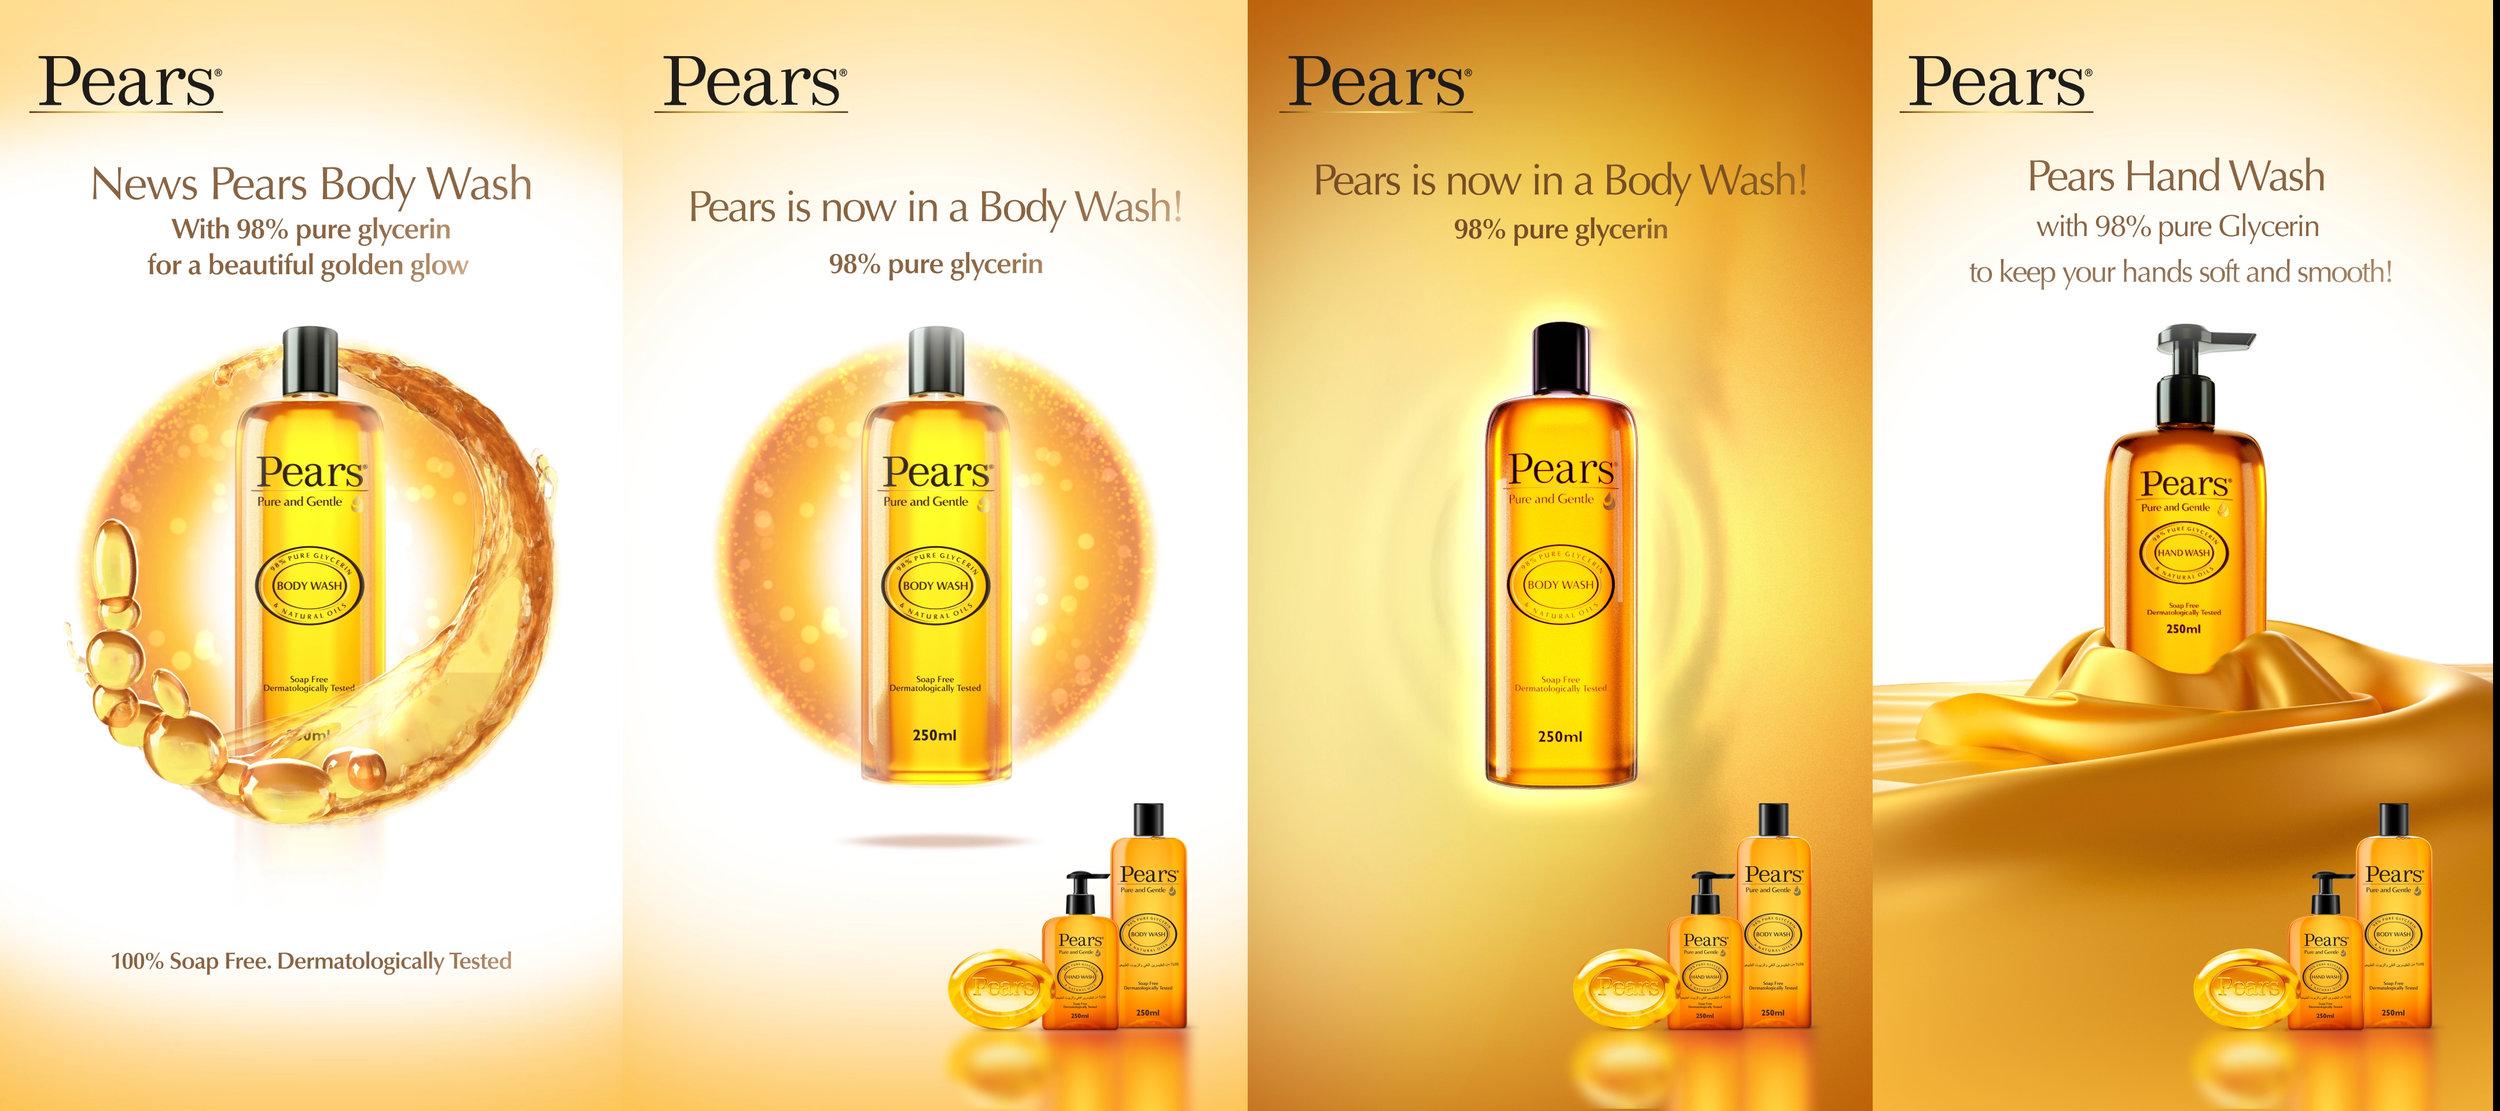 Pears_all.jpg